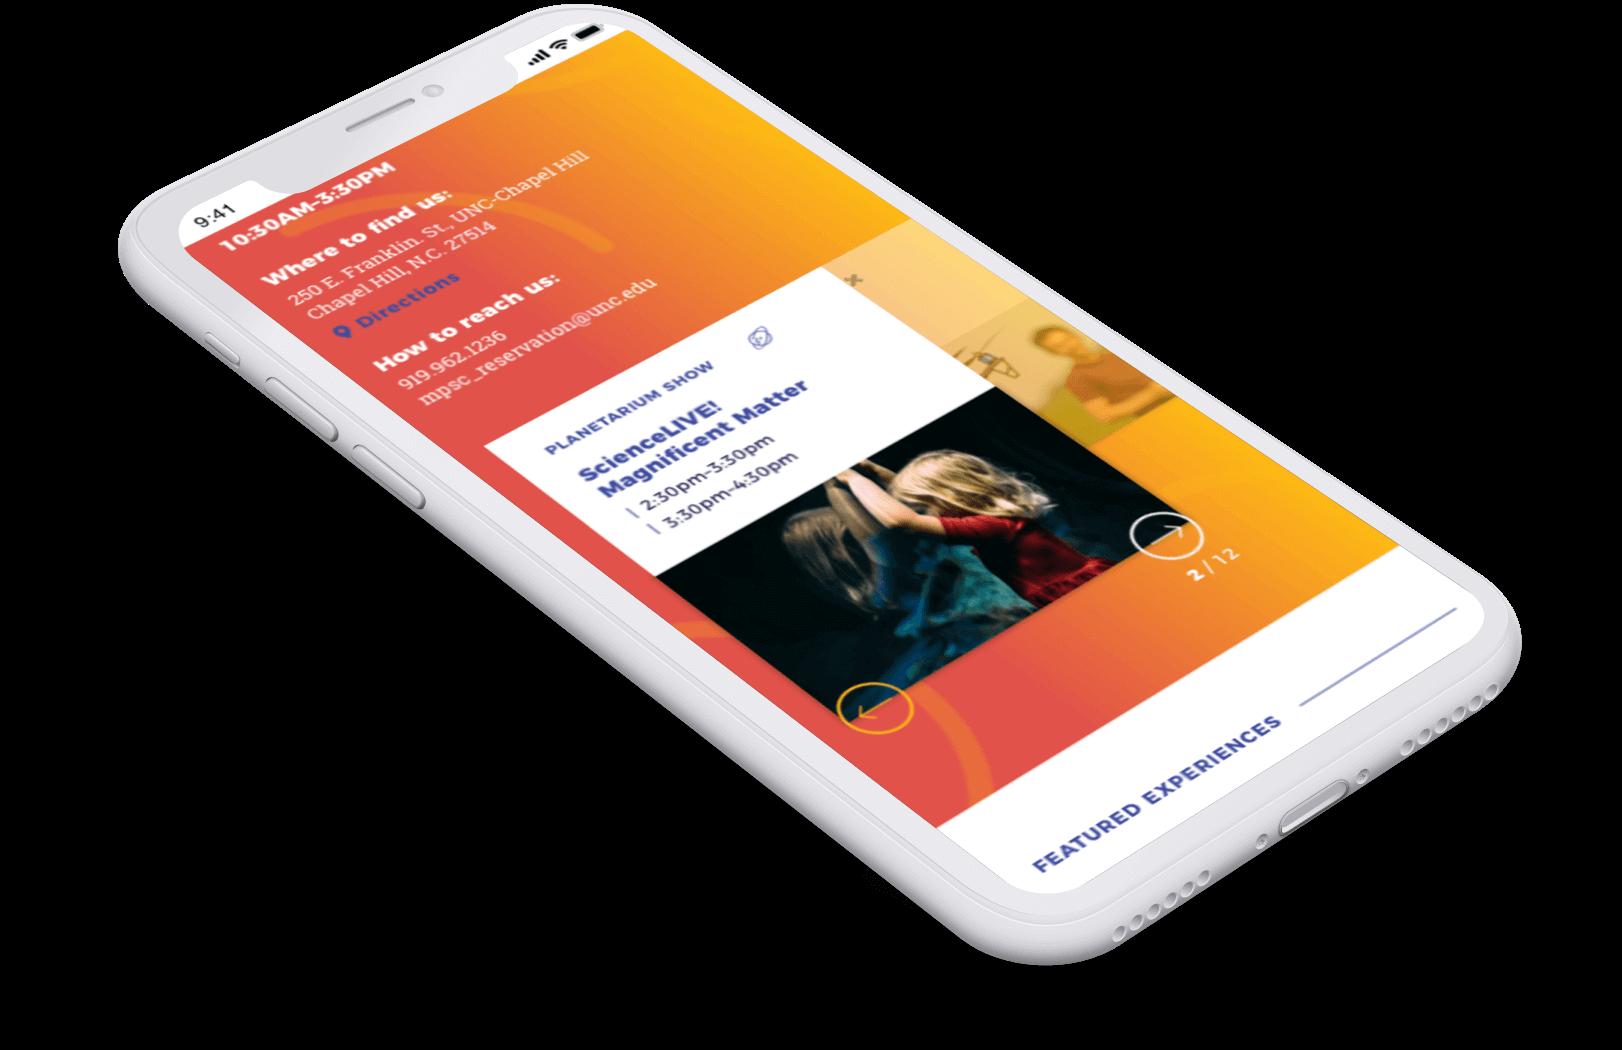 Morehead Planetarium Calendar web page on mobile screen